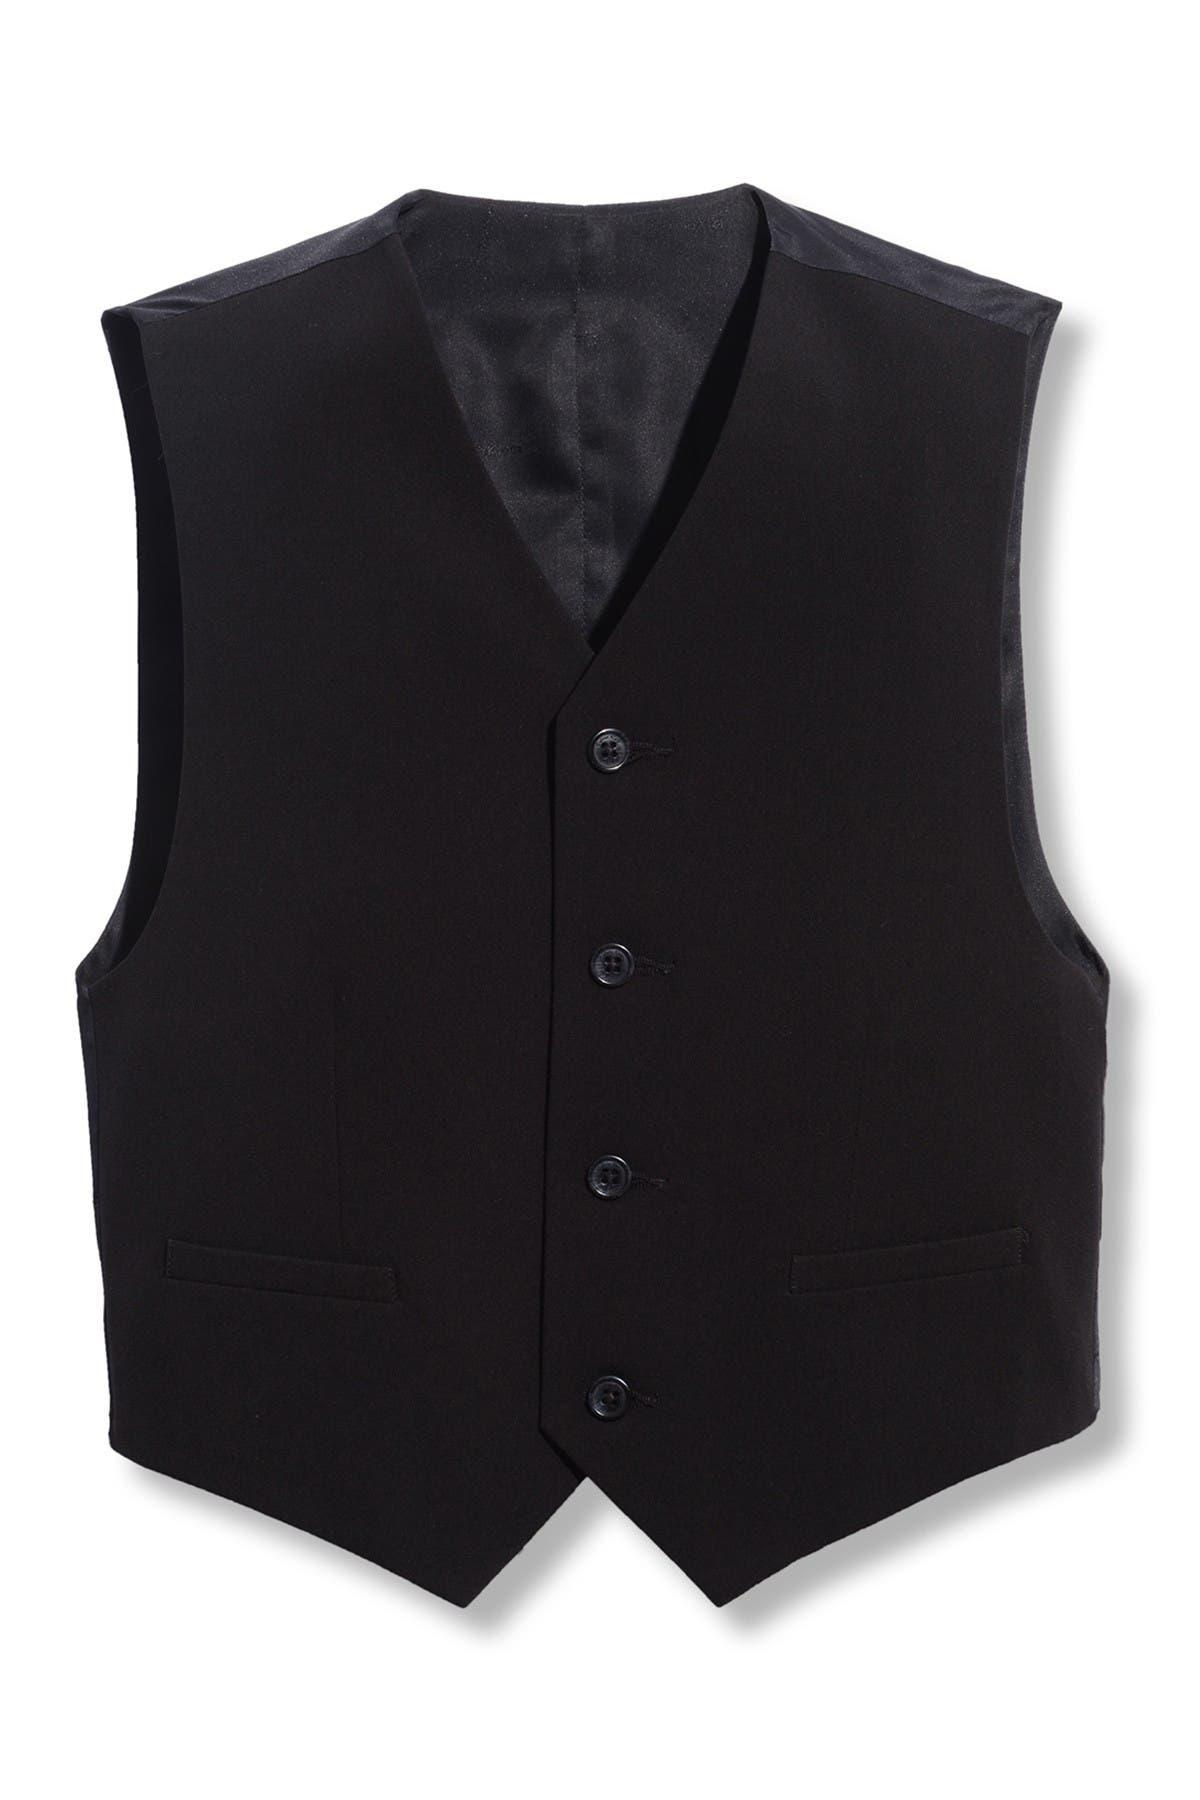 Image of Calvin Klein Infinite Stretch Suit Separate Vest